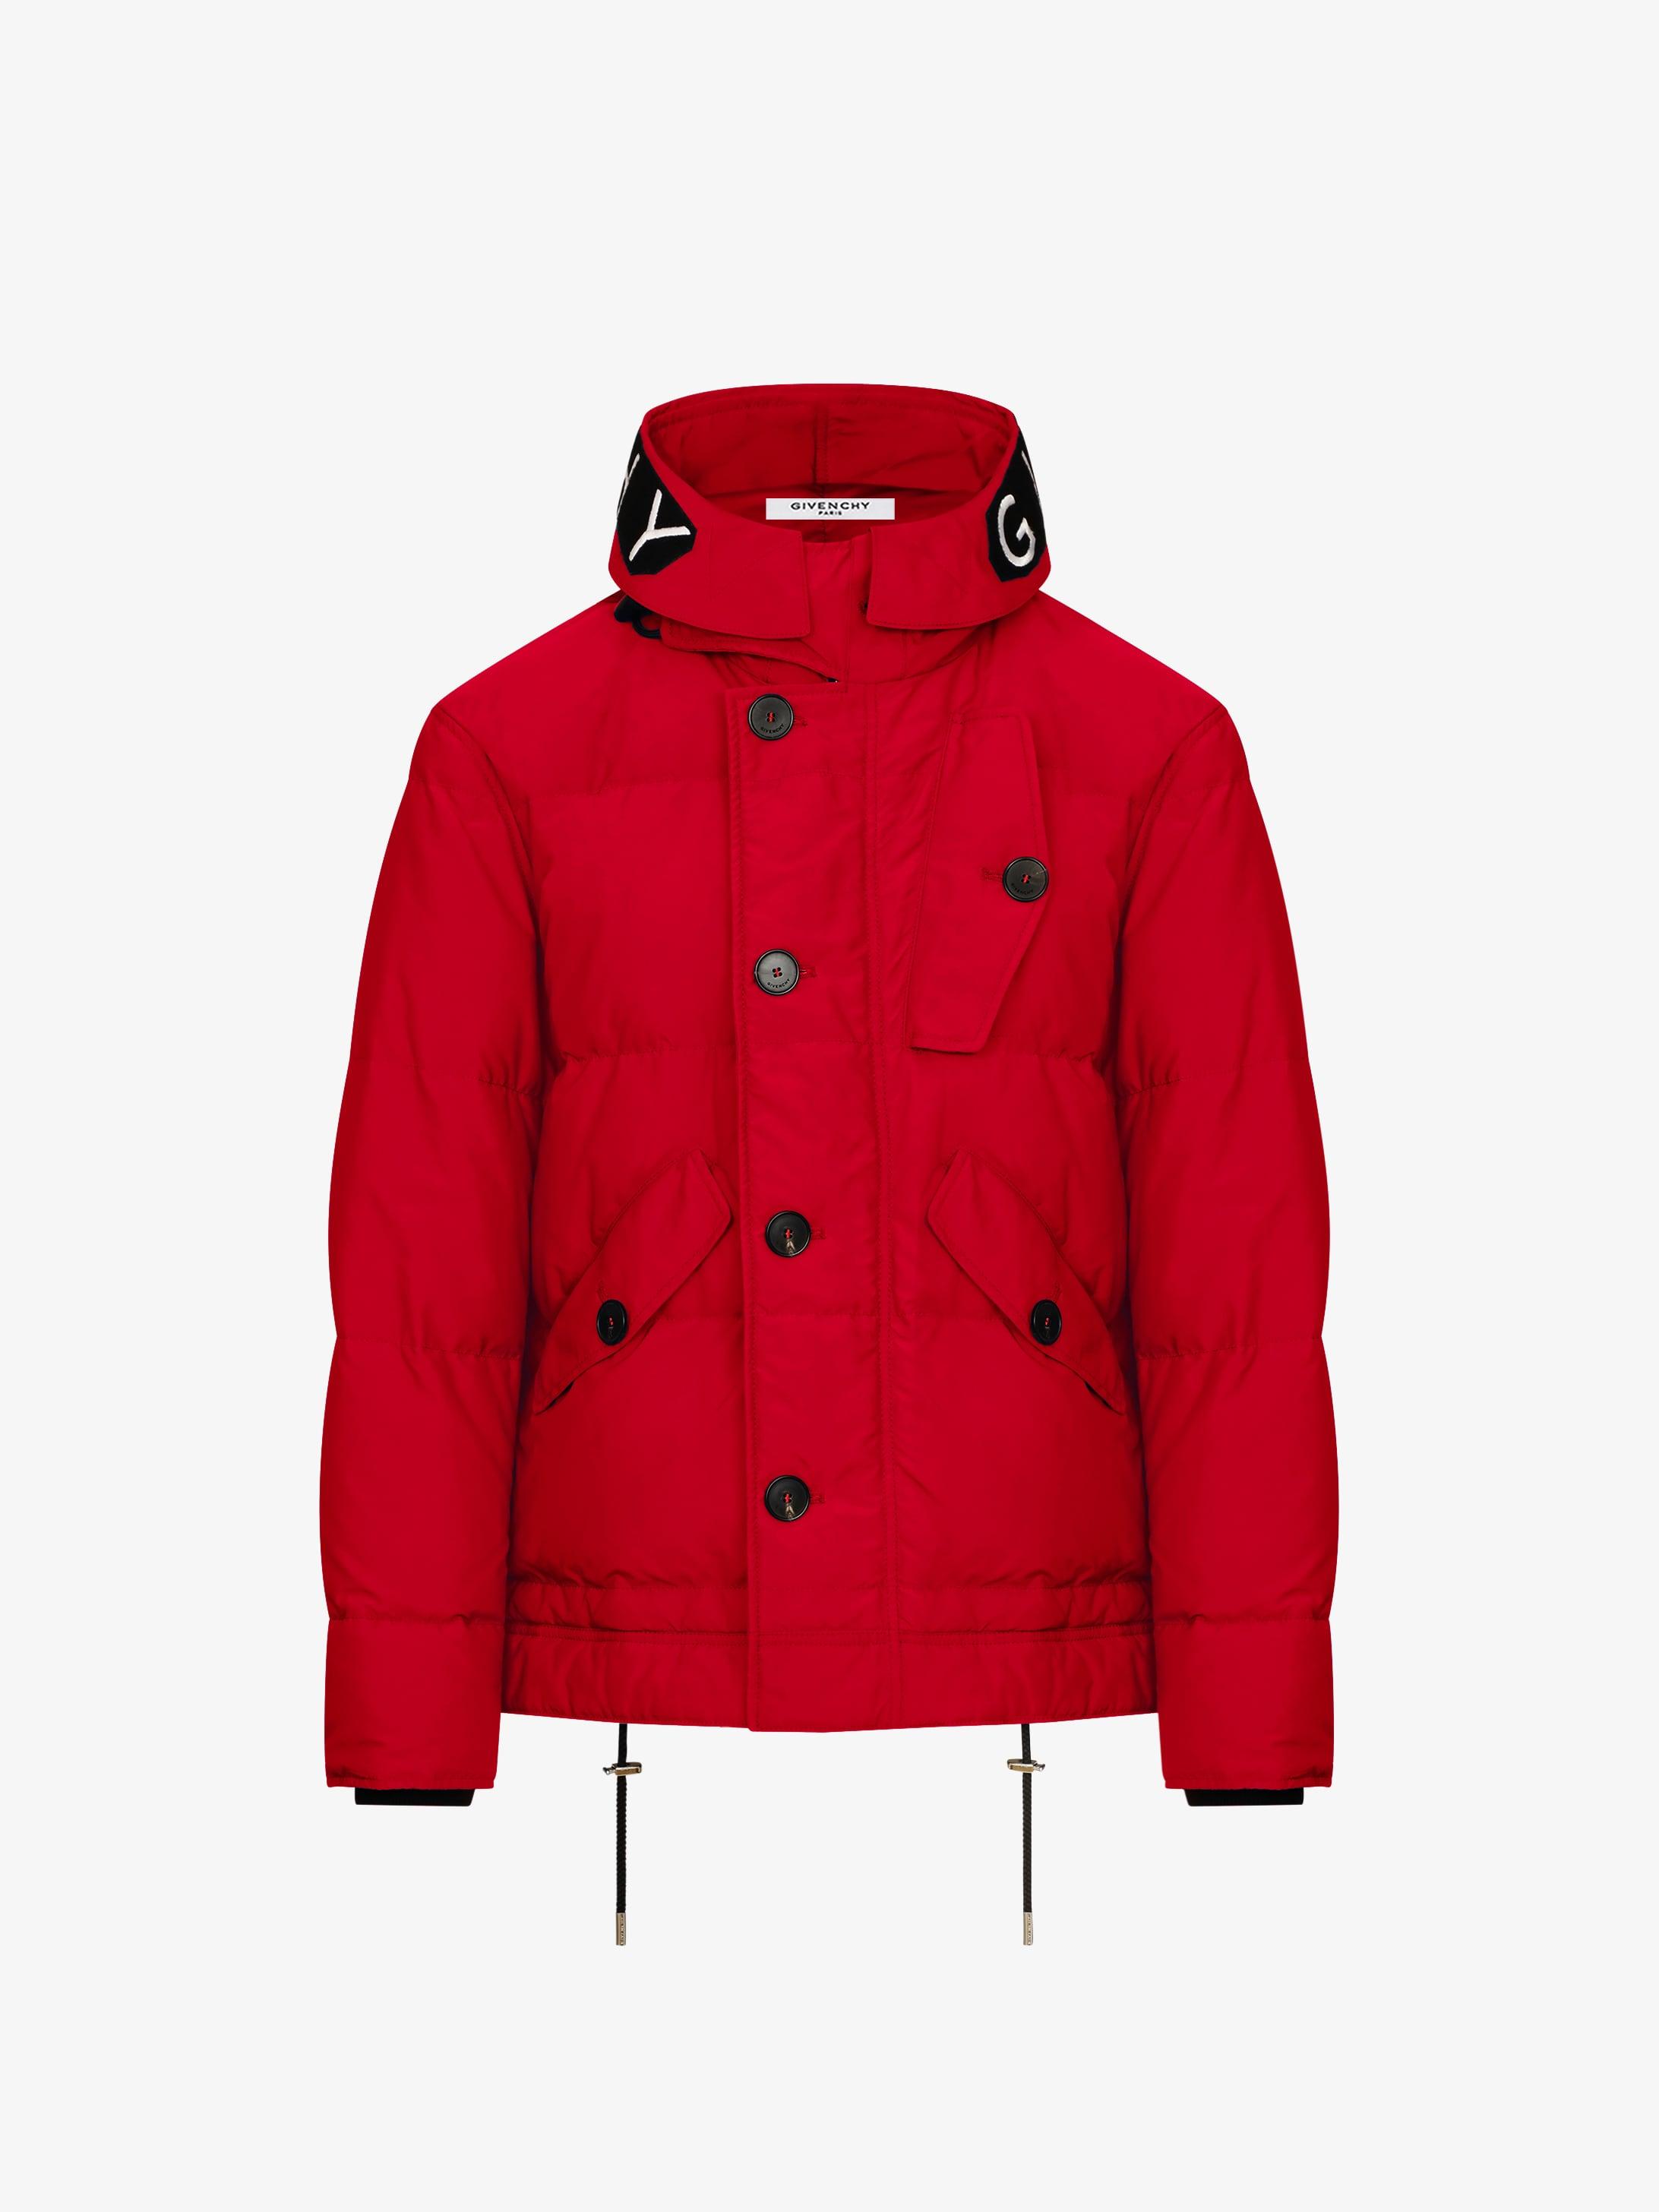 GIVENCHY hooded puffa jacket